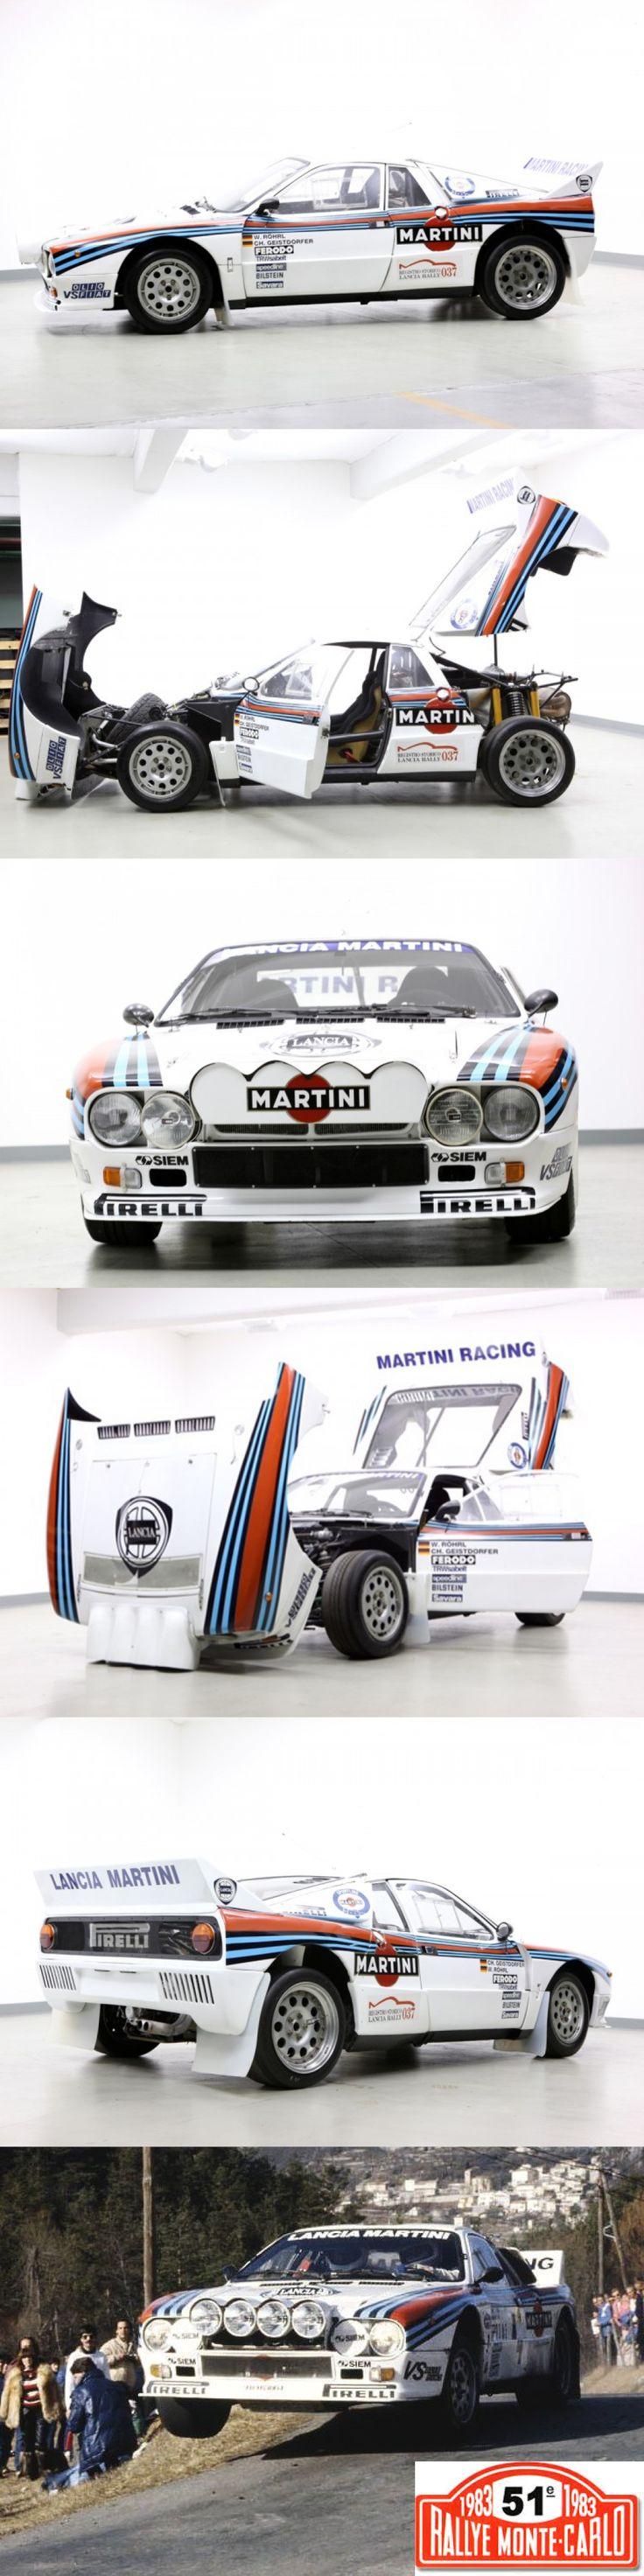 1983 Lancia 037 Rally Monte Carlo Winner / W. Röhrl - C. Geistdörfer / Abarth Pininfarina / Italy / livery / white blue red / 17-415